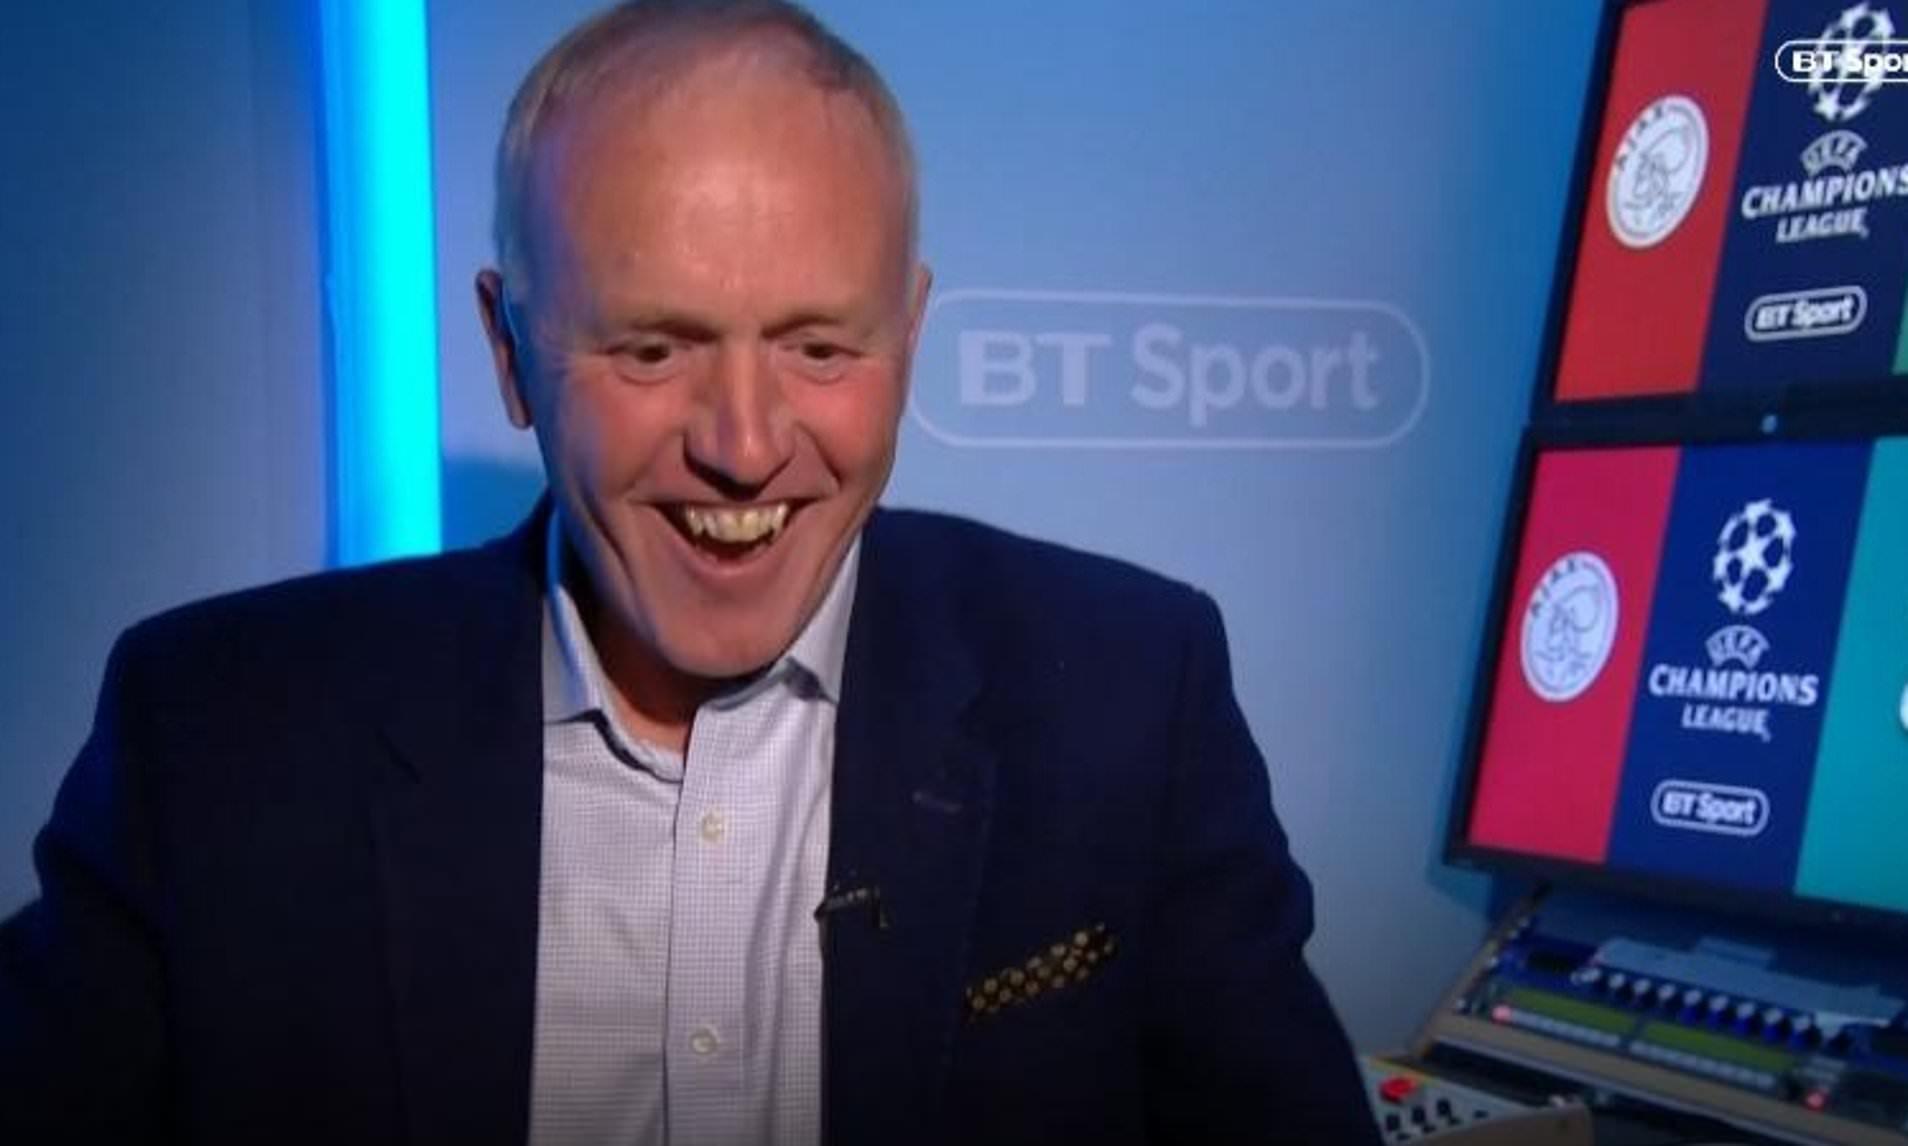 Wolves vs Arsenal: Luiz was careless – Ex-EPL referee, Walton backs Craig Pawson's red card decision